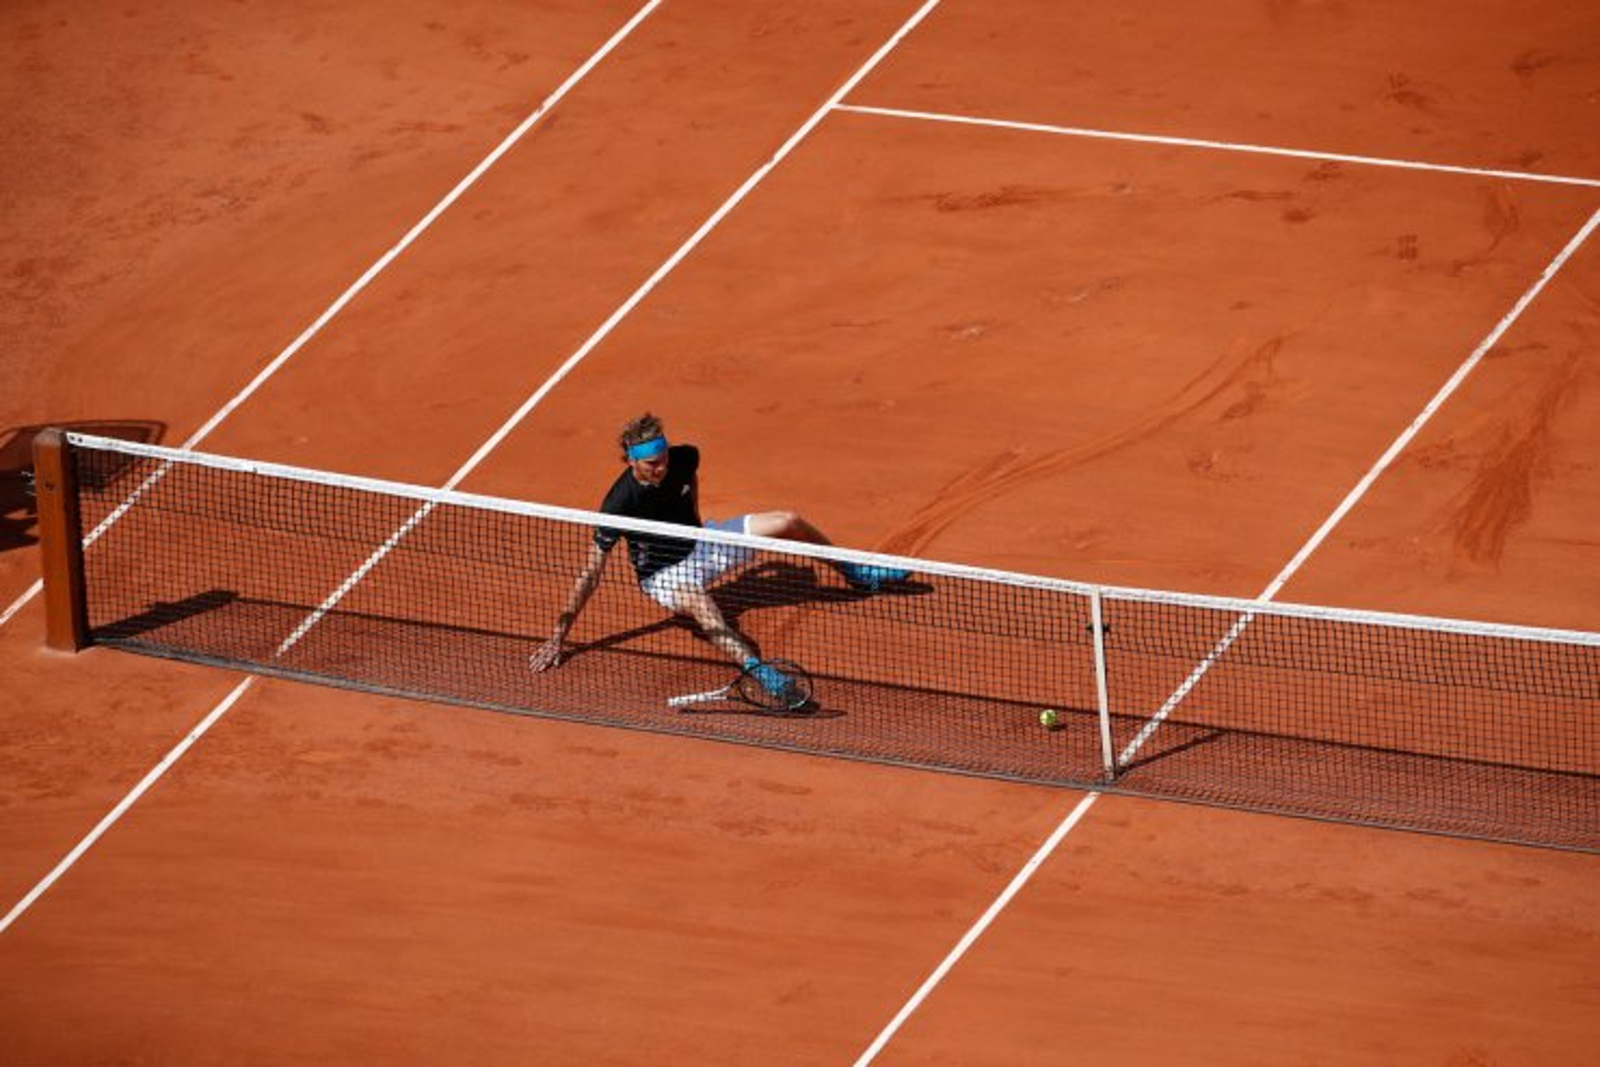 Germany's Alexander Zverev slips and falls as he runs to return Serbia's Novak Djokovic's drop shot during their quarterfinal match of the French Open tennis tournament at the Roland Garros stadium in Paris, Thursday, June 6, 2019. AP